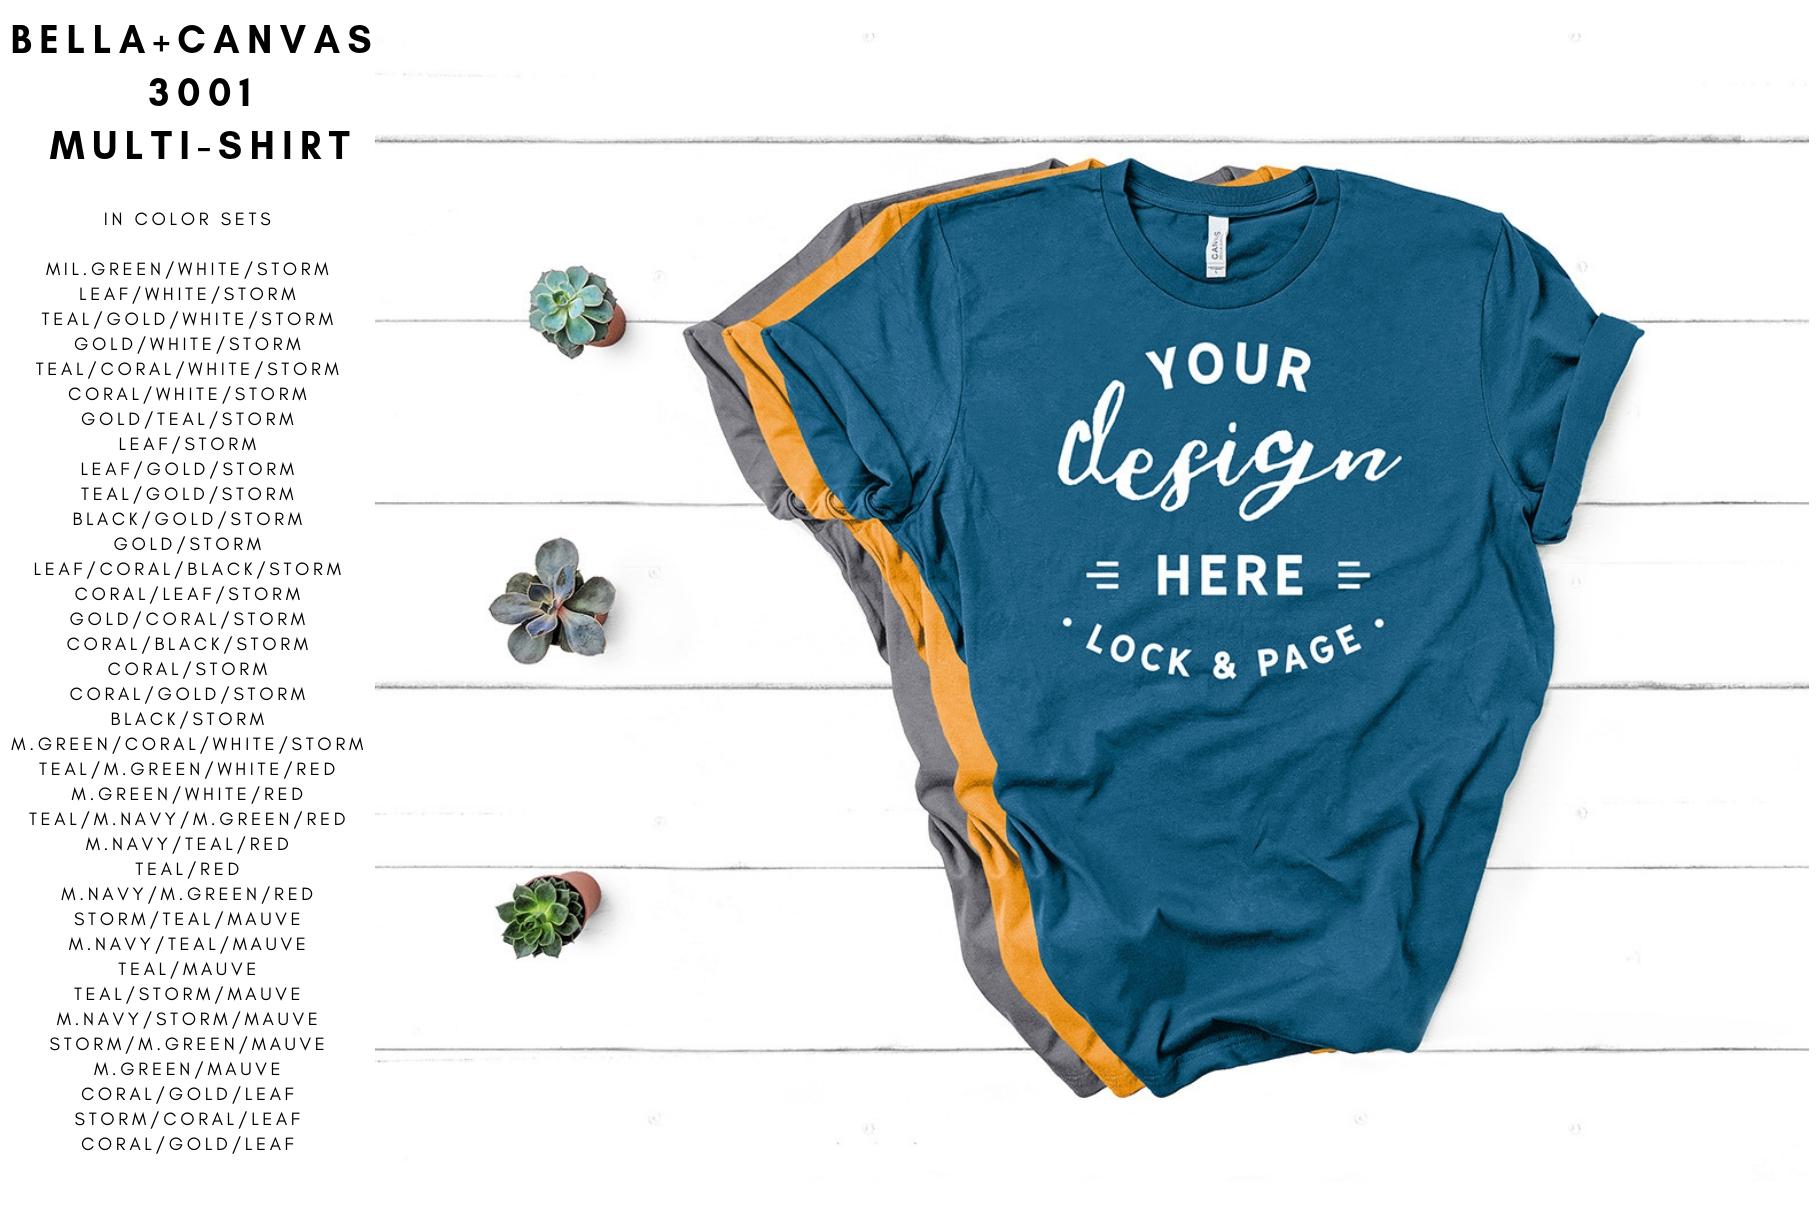 34e715ff3 Bella Canvas T-Shirt Mockup Spring Summer Mega Bundle example image 8